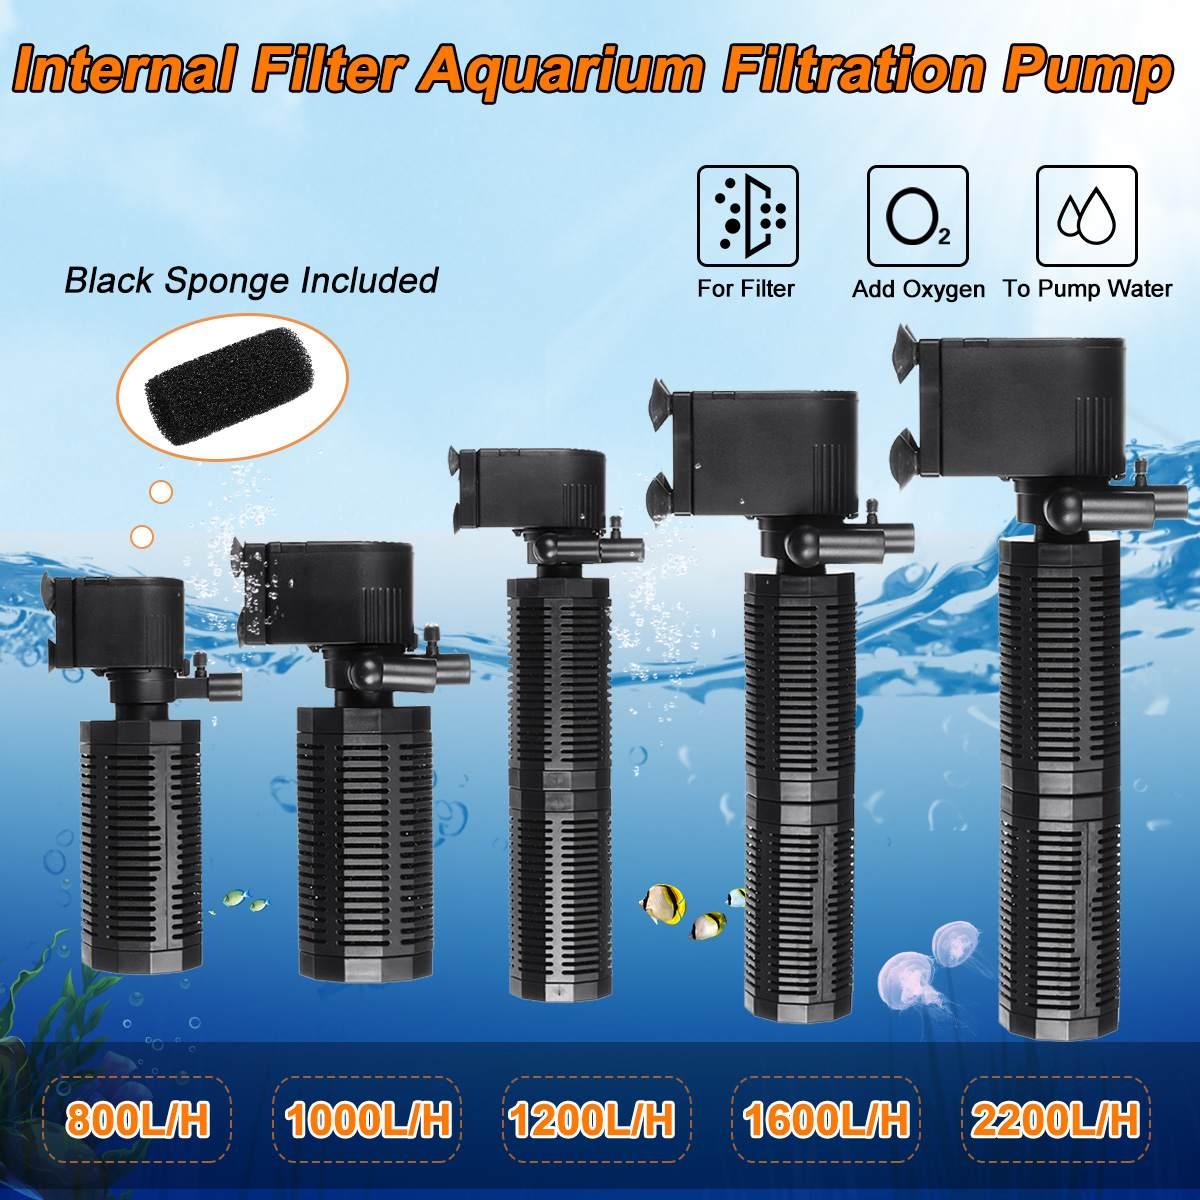 13W/18W/25W/30W/40W Biological Internal Filter Fish Tank Aquarium Filtration Pump 800-2200l/h Submersible Aquarium Water Pump